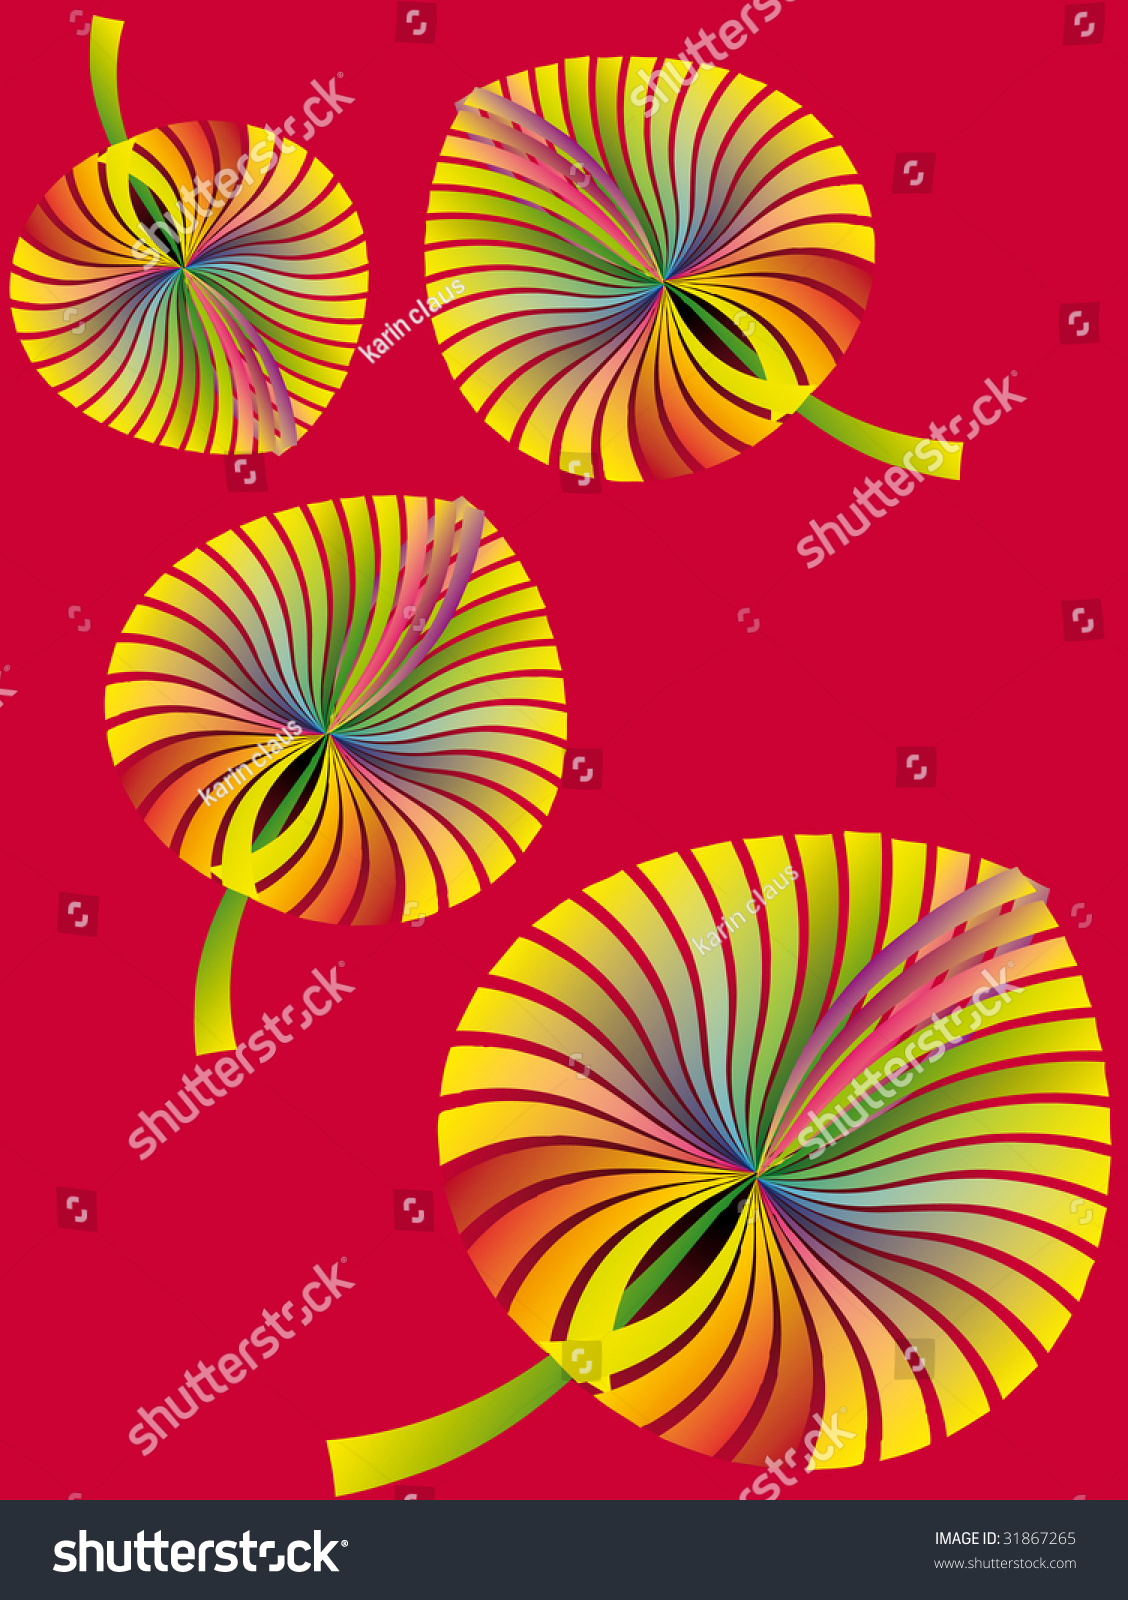 Fantasy Wallpaper Collection Rainbow Colored Autumn Stock Vector ...